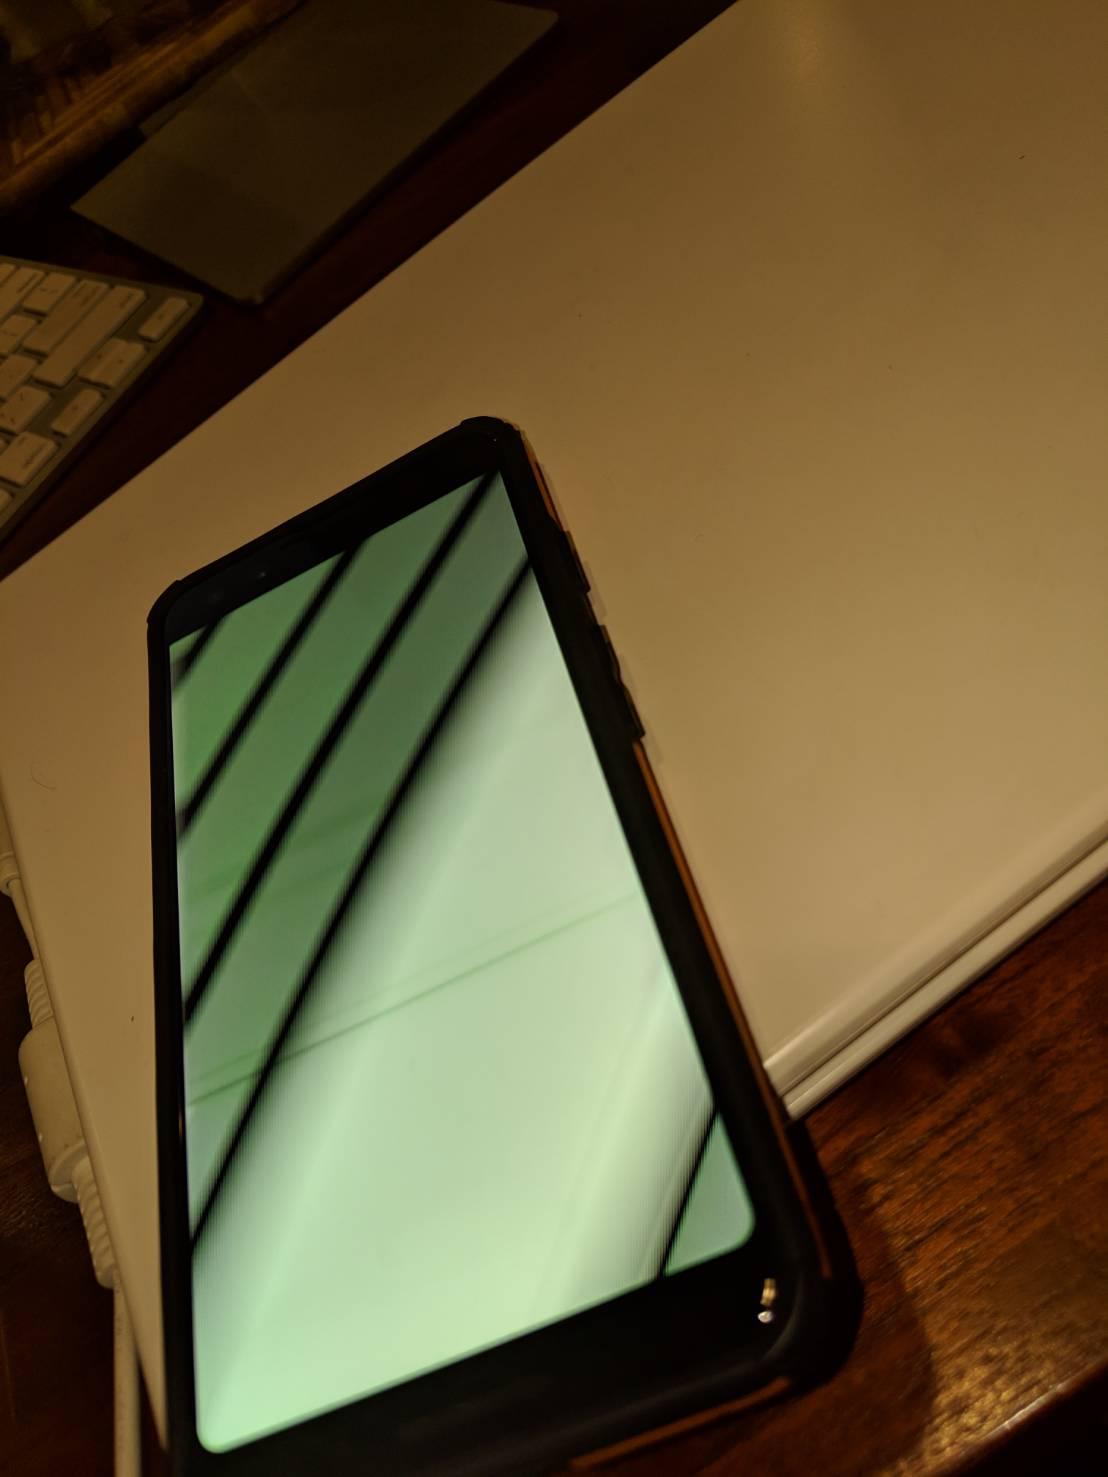 My pixel 3 screen is flashing as crazy  Unusable - Pixel Phone Help